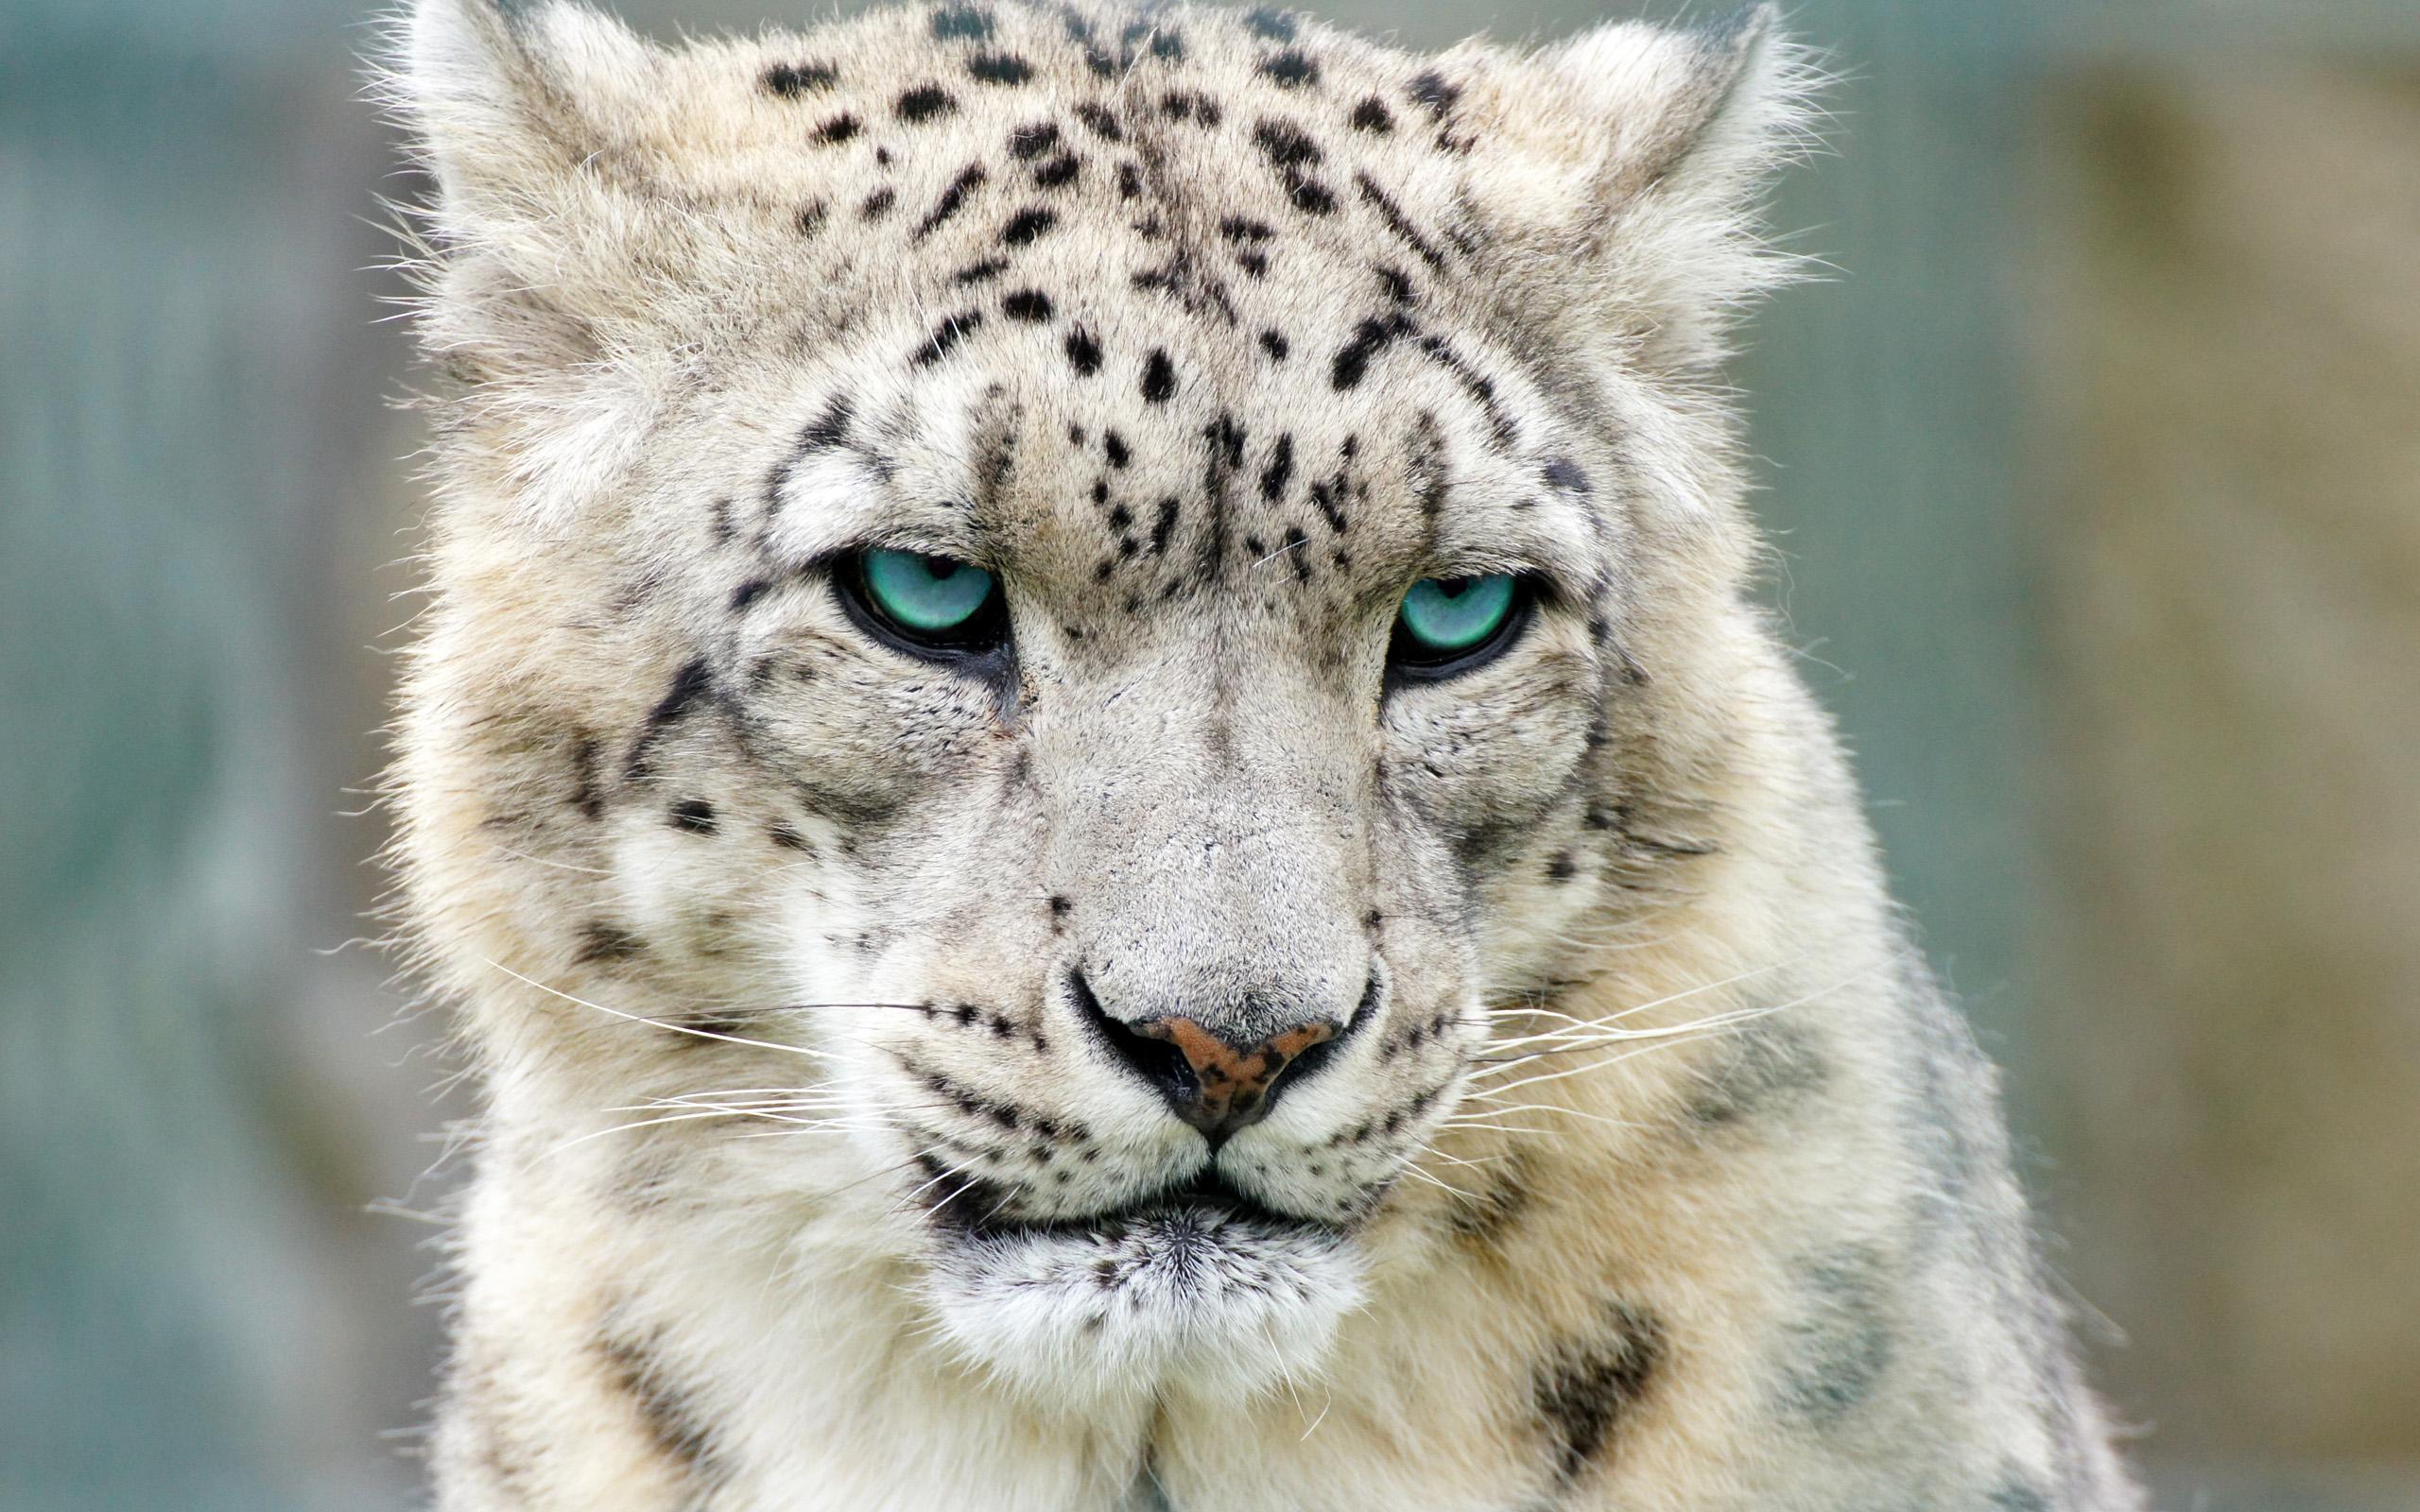 Snow Leopard Hd Wallpaper Background Image 2560x1600 Id 352649